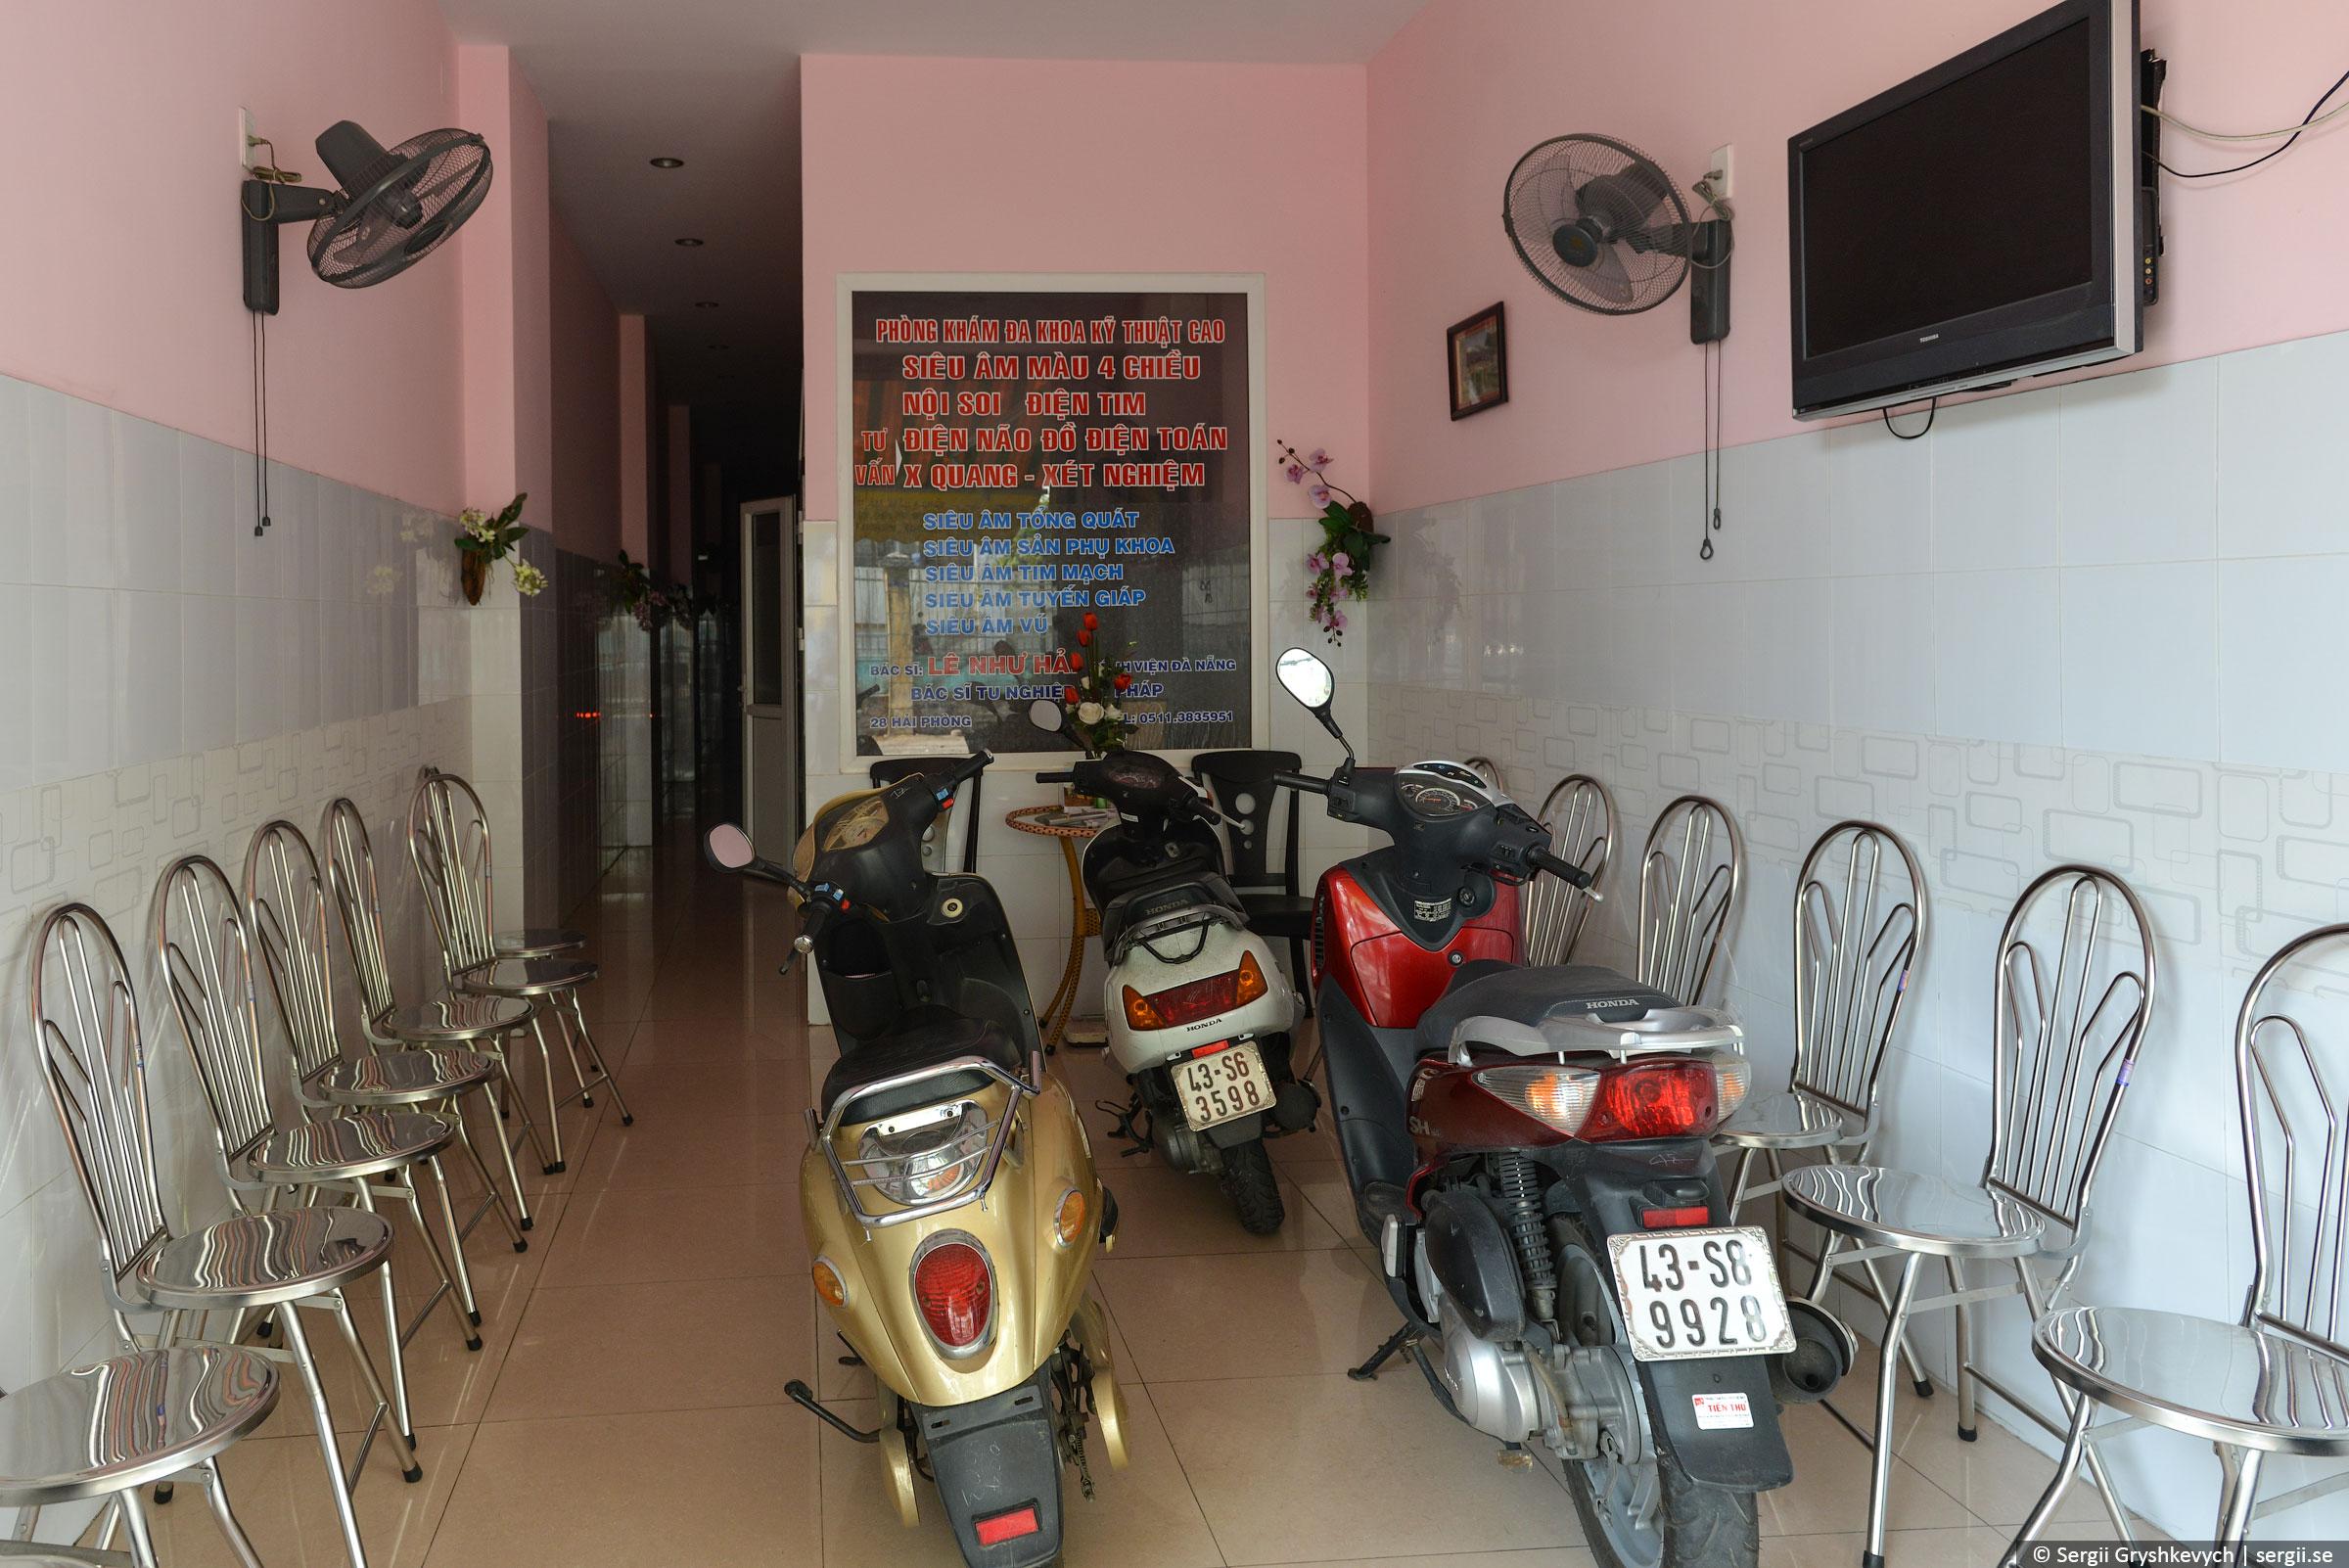 da-nang-vietnam-2014-9